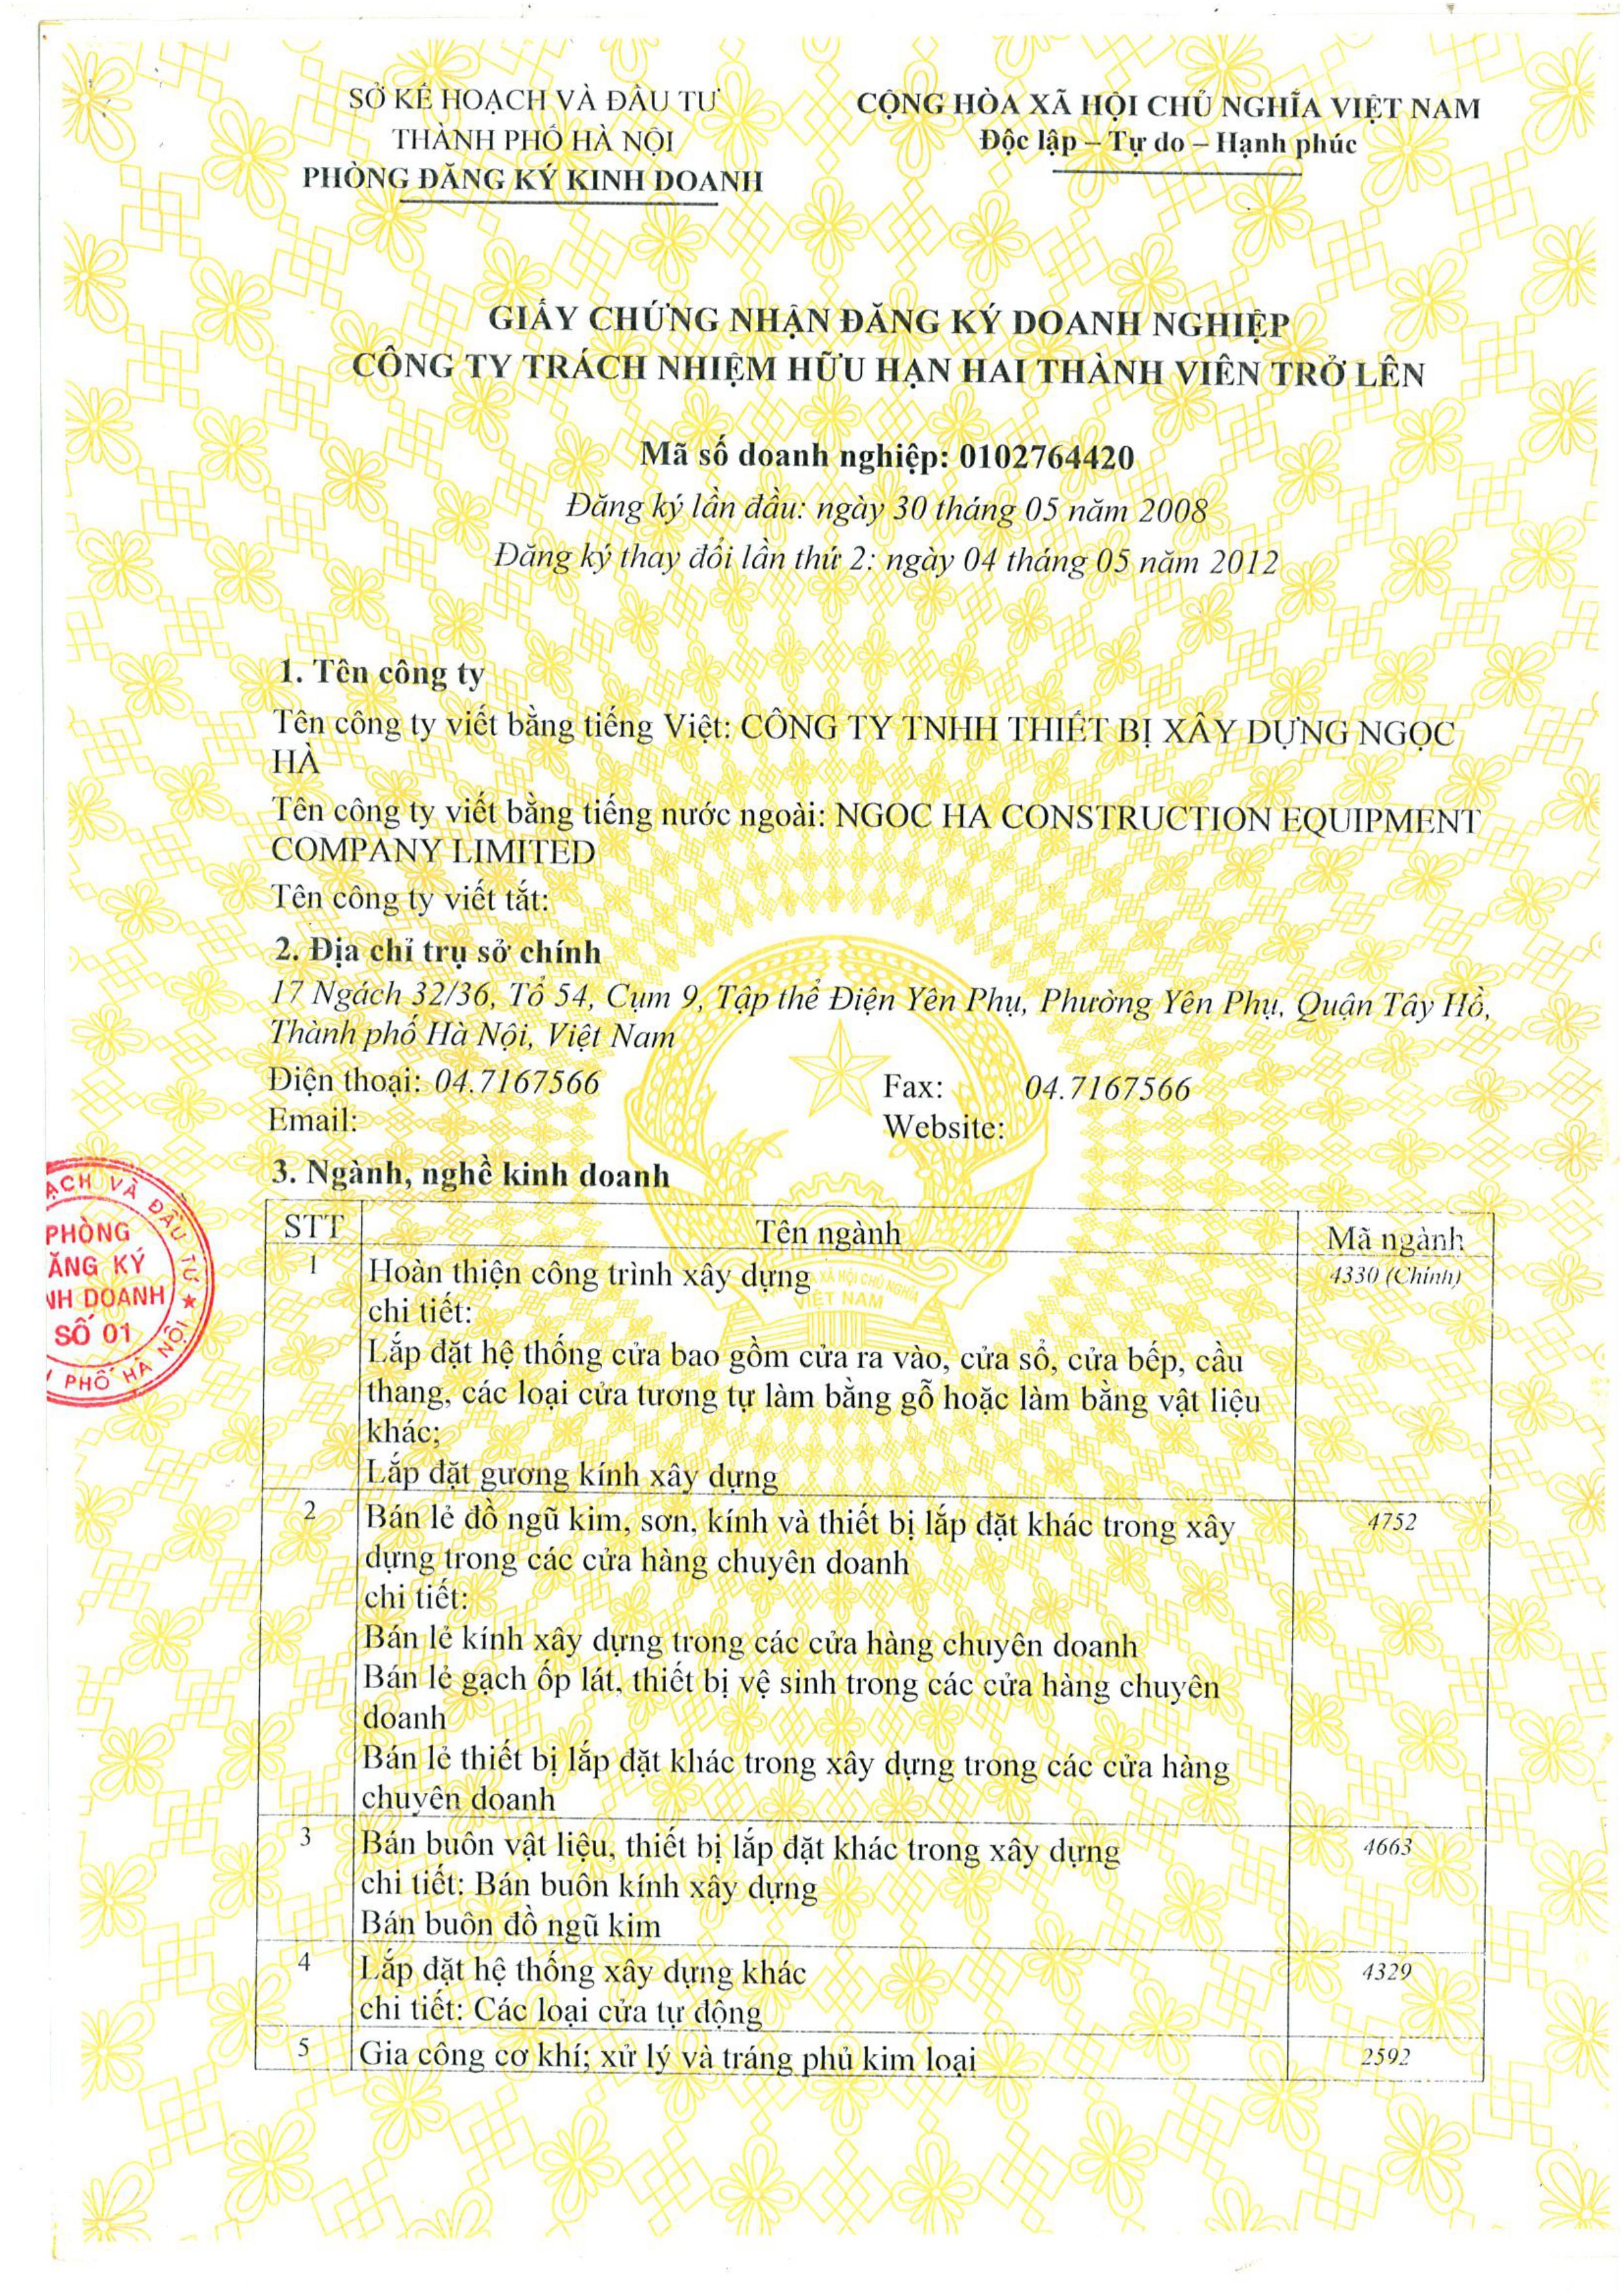 giấy đăng ký kinh doanh 1